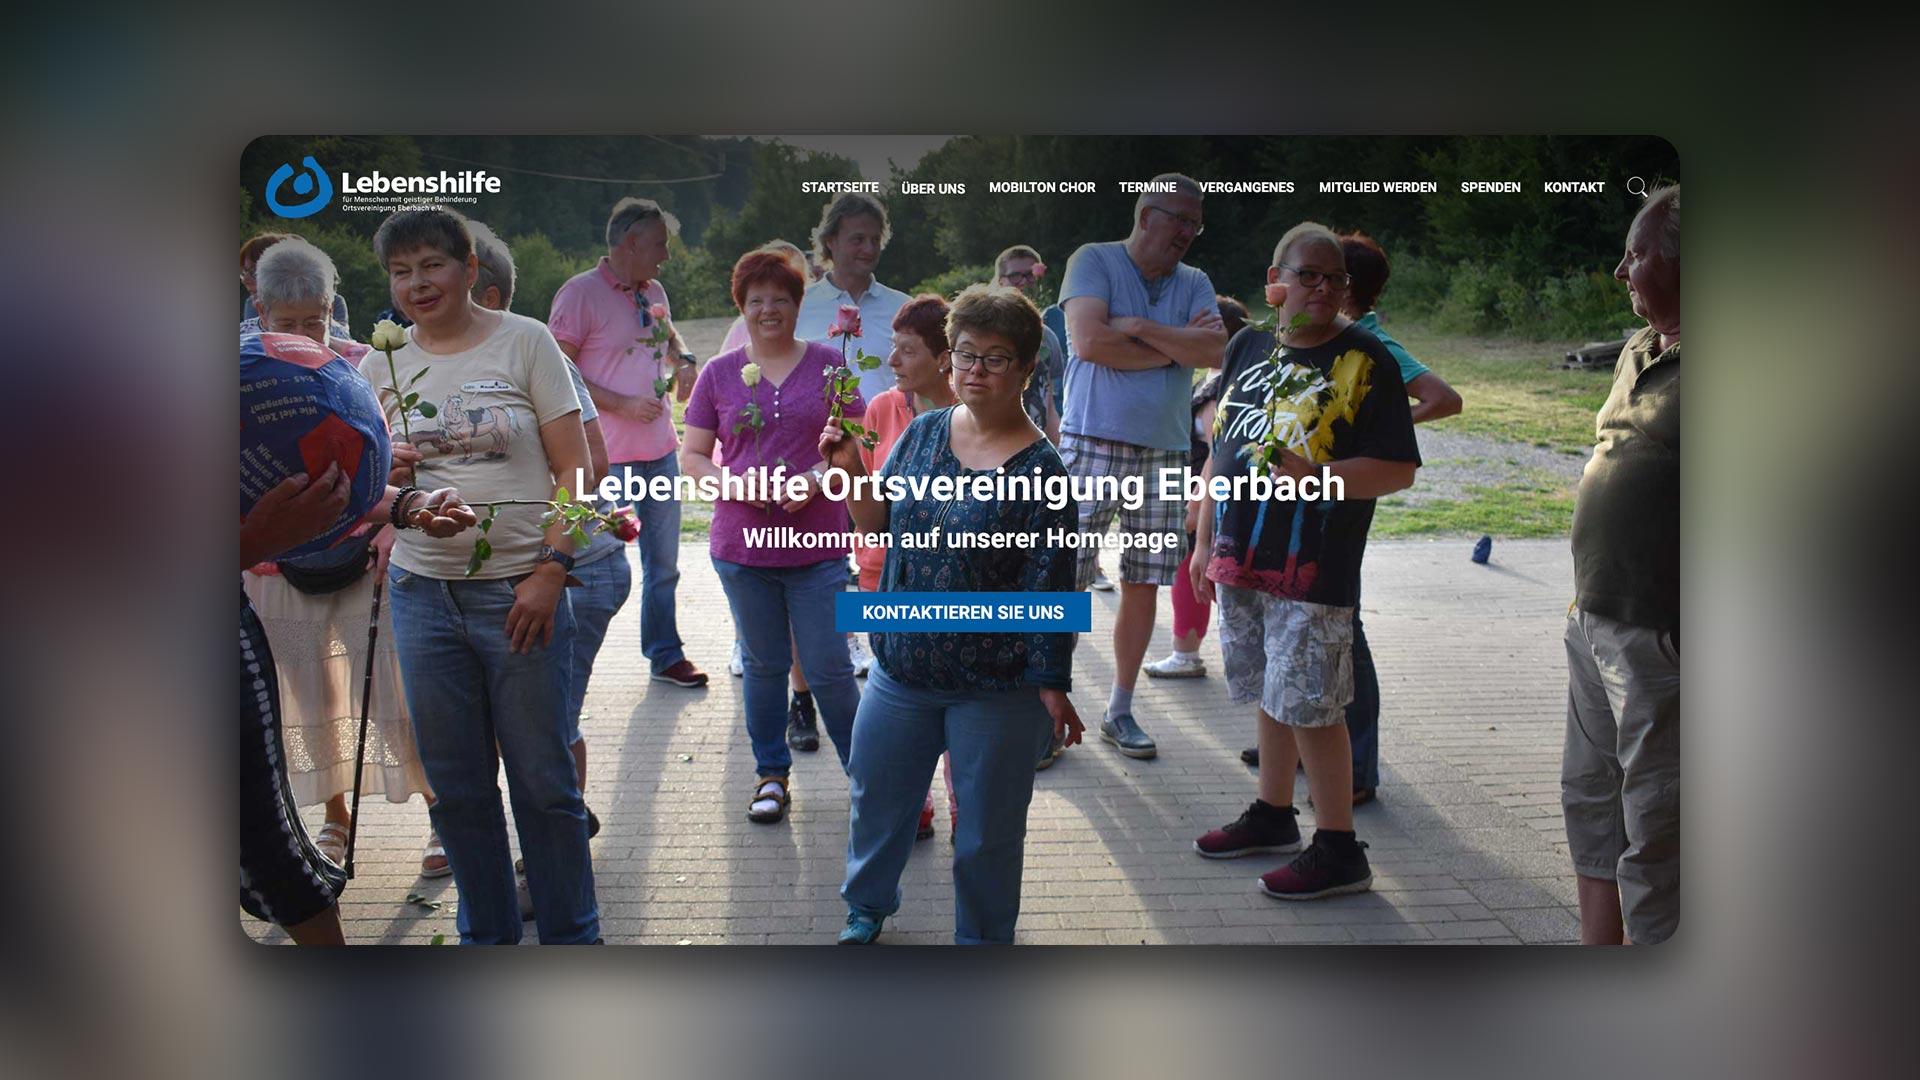 Mischler Webdesign Mannheim portfolio lebenshilfe eberbach charity projekt